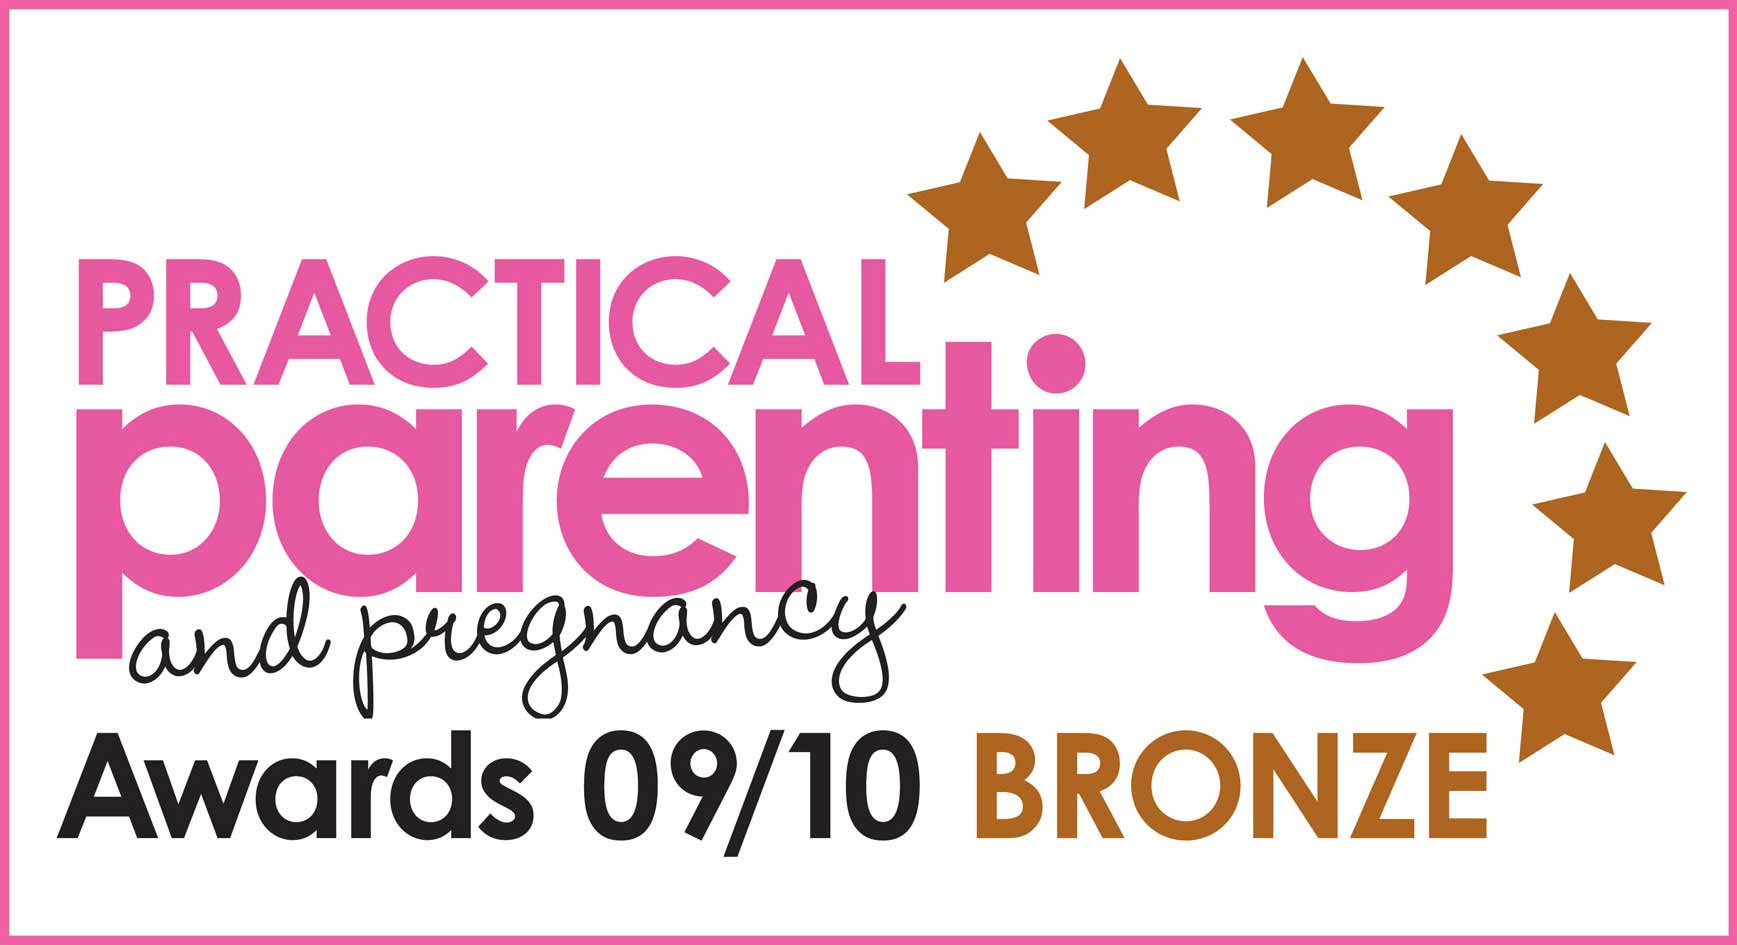 PRACTICAL PARENTING 2010 BRONZE